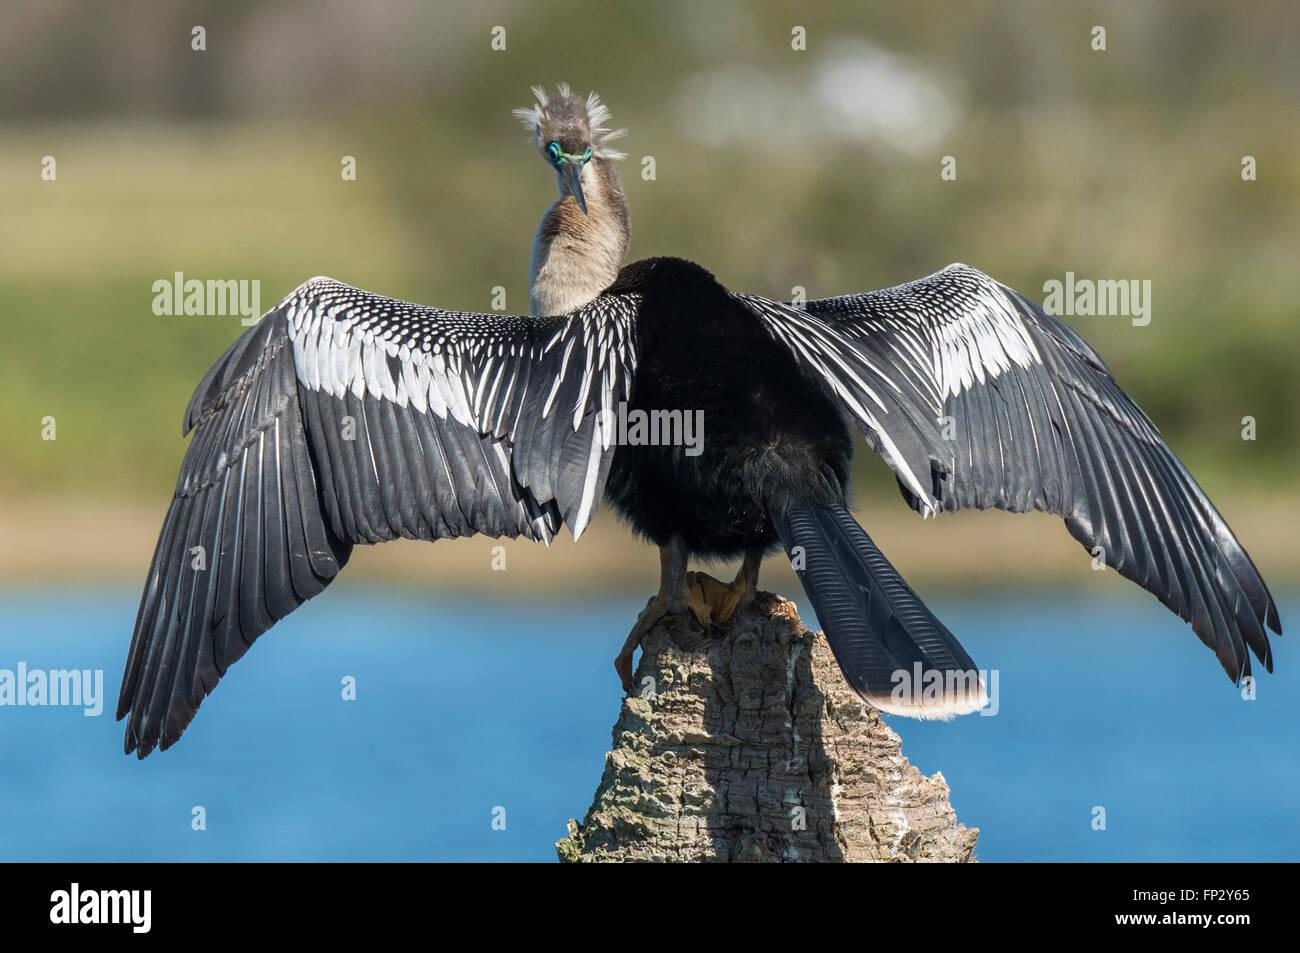 Male Anhinga, Snake Bird, or Water turkey with breeding plumage - Stock Image